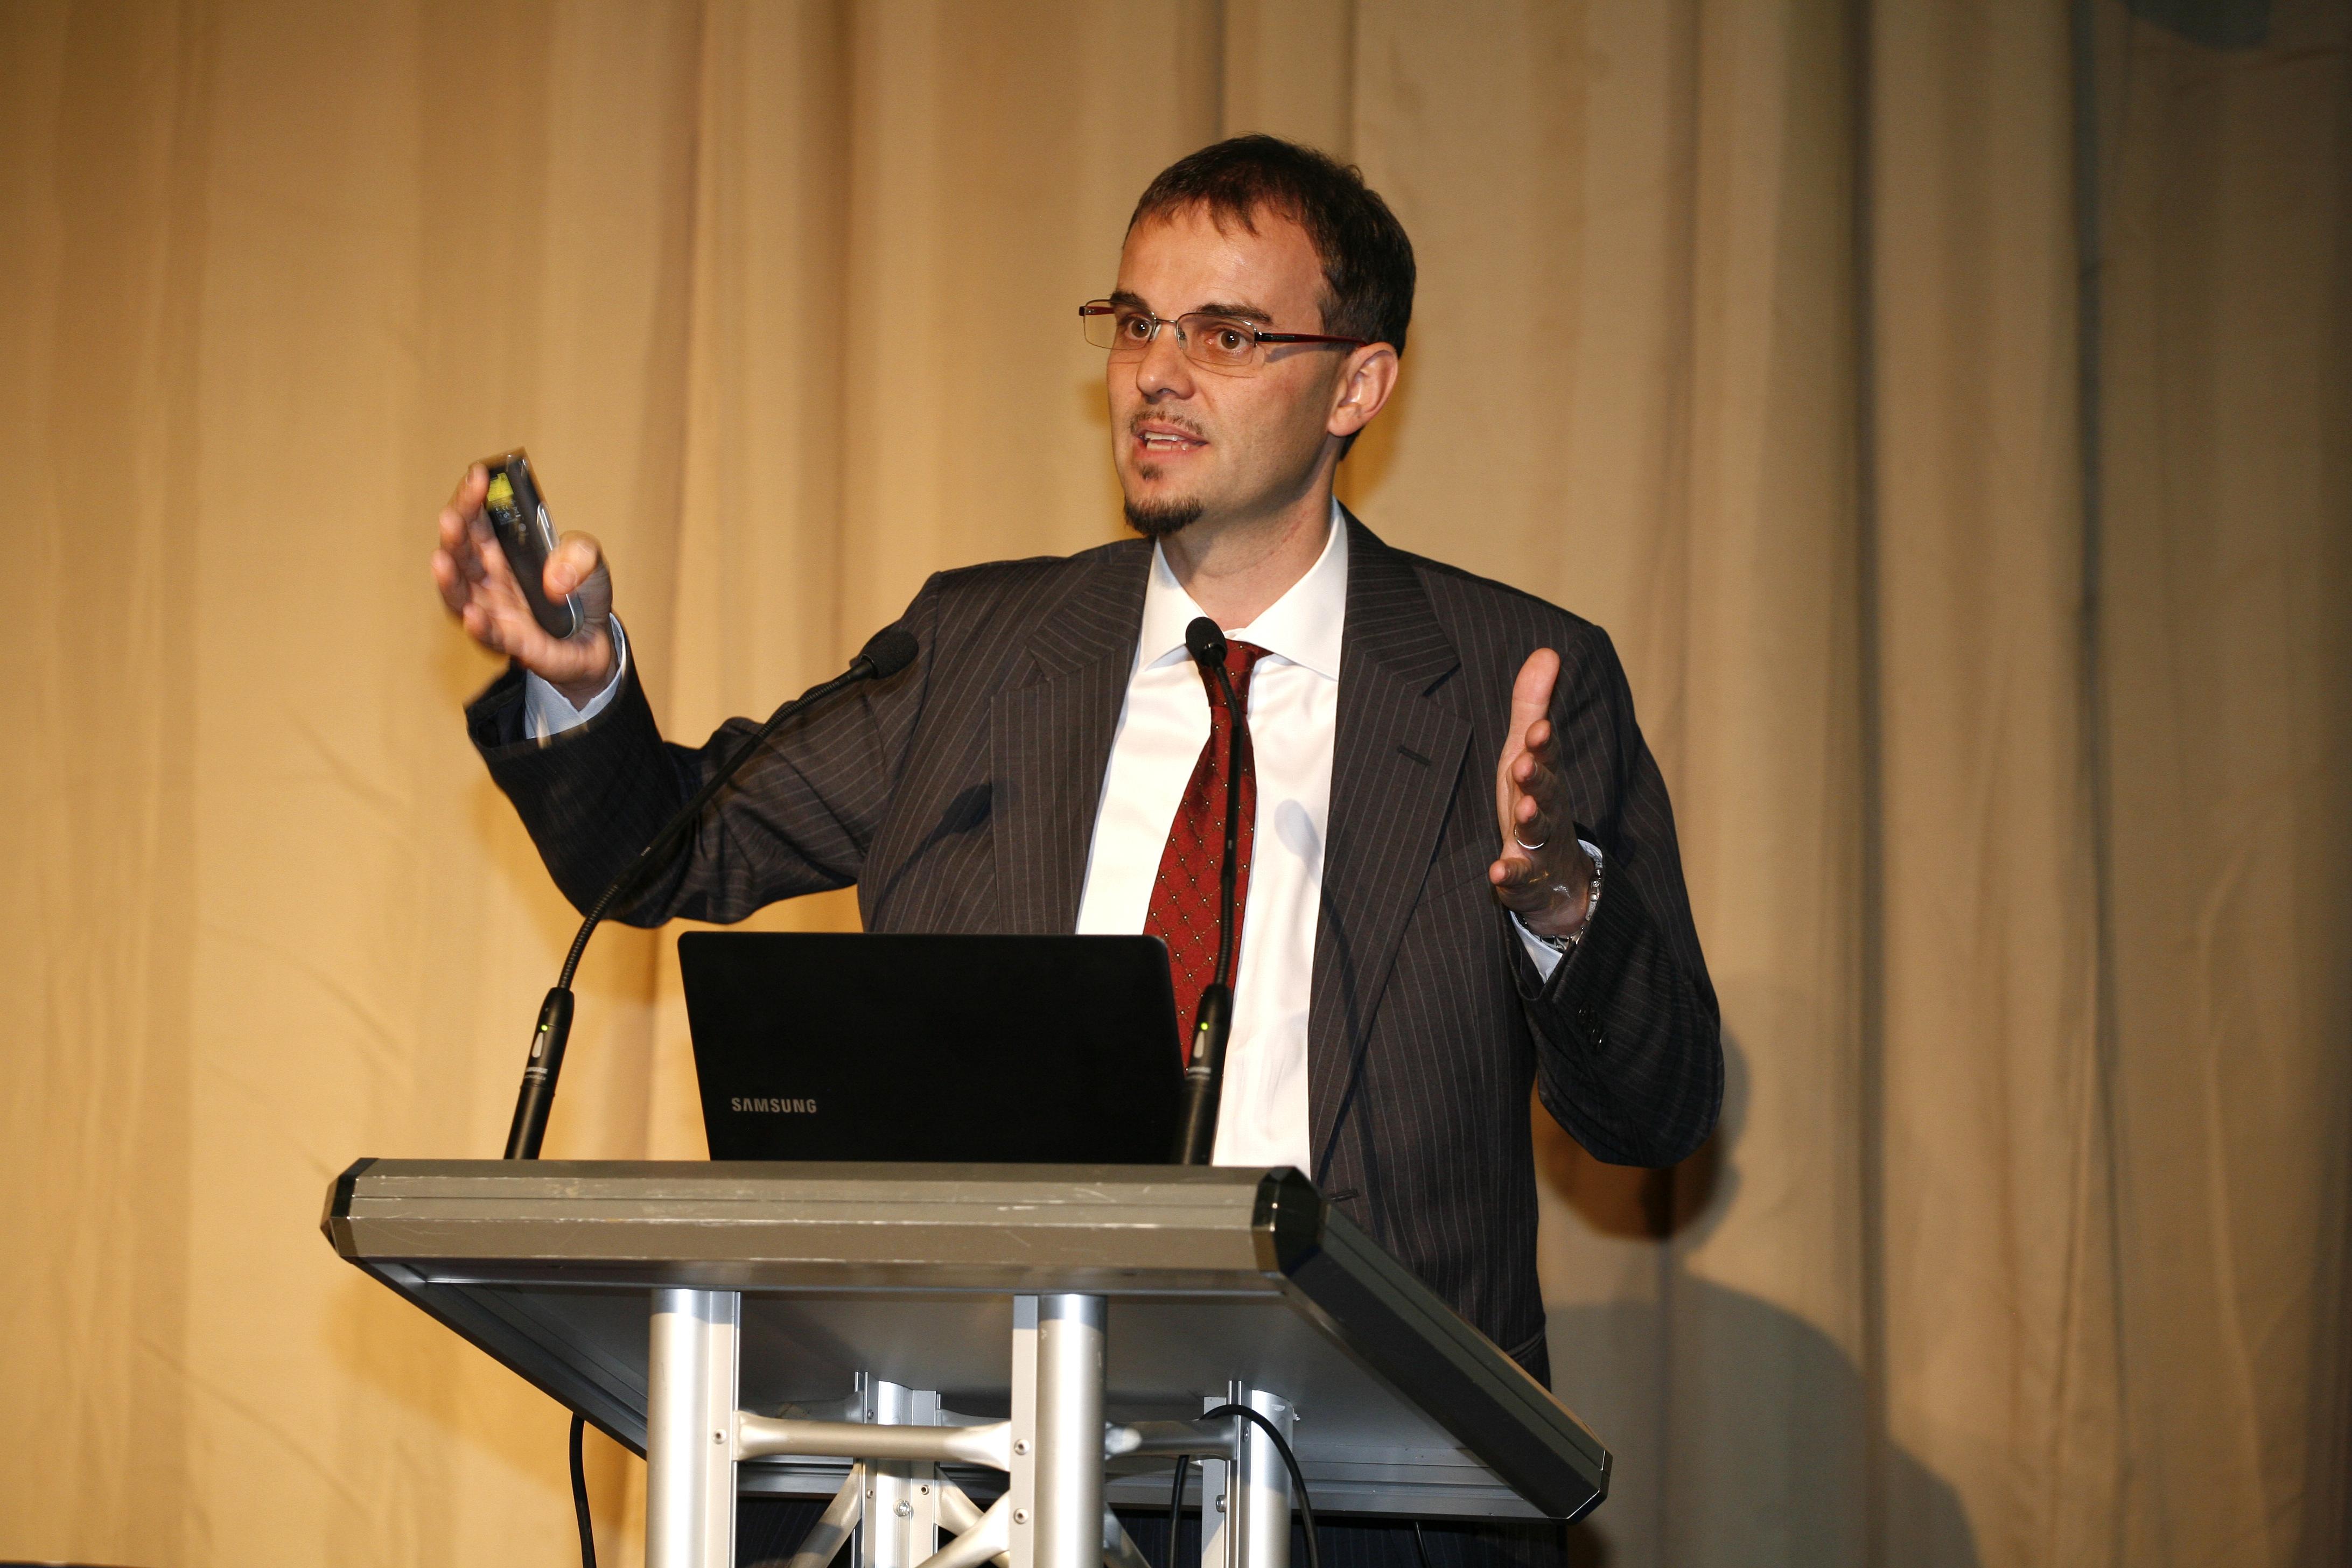 Dr. Matteo Basso